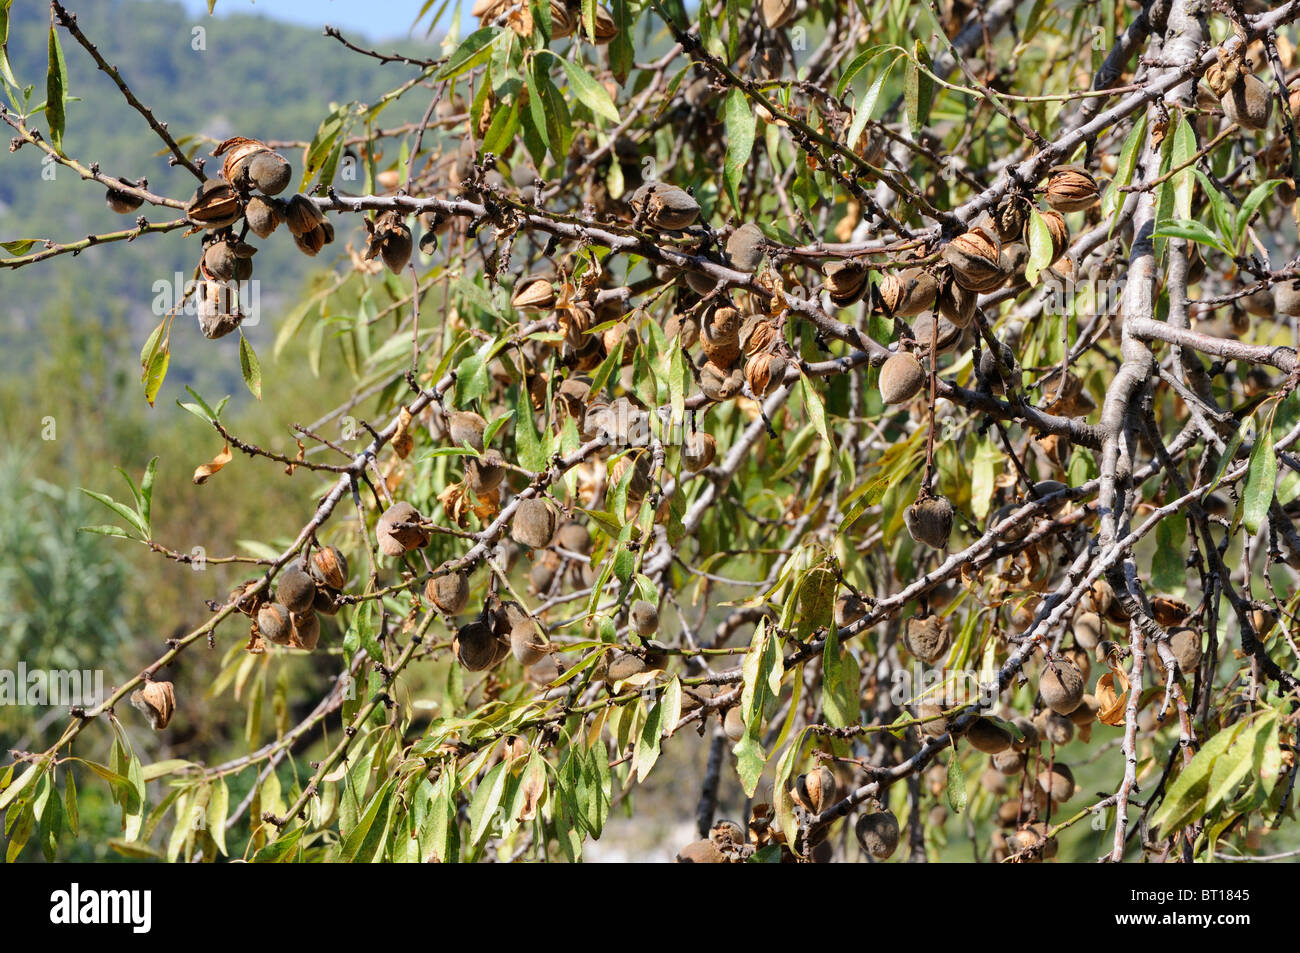 Almonds growing in Majorca - Stock Image